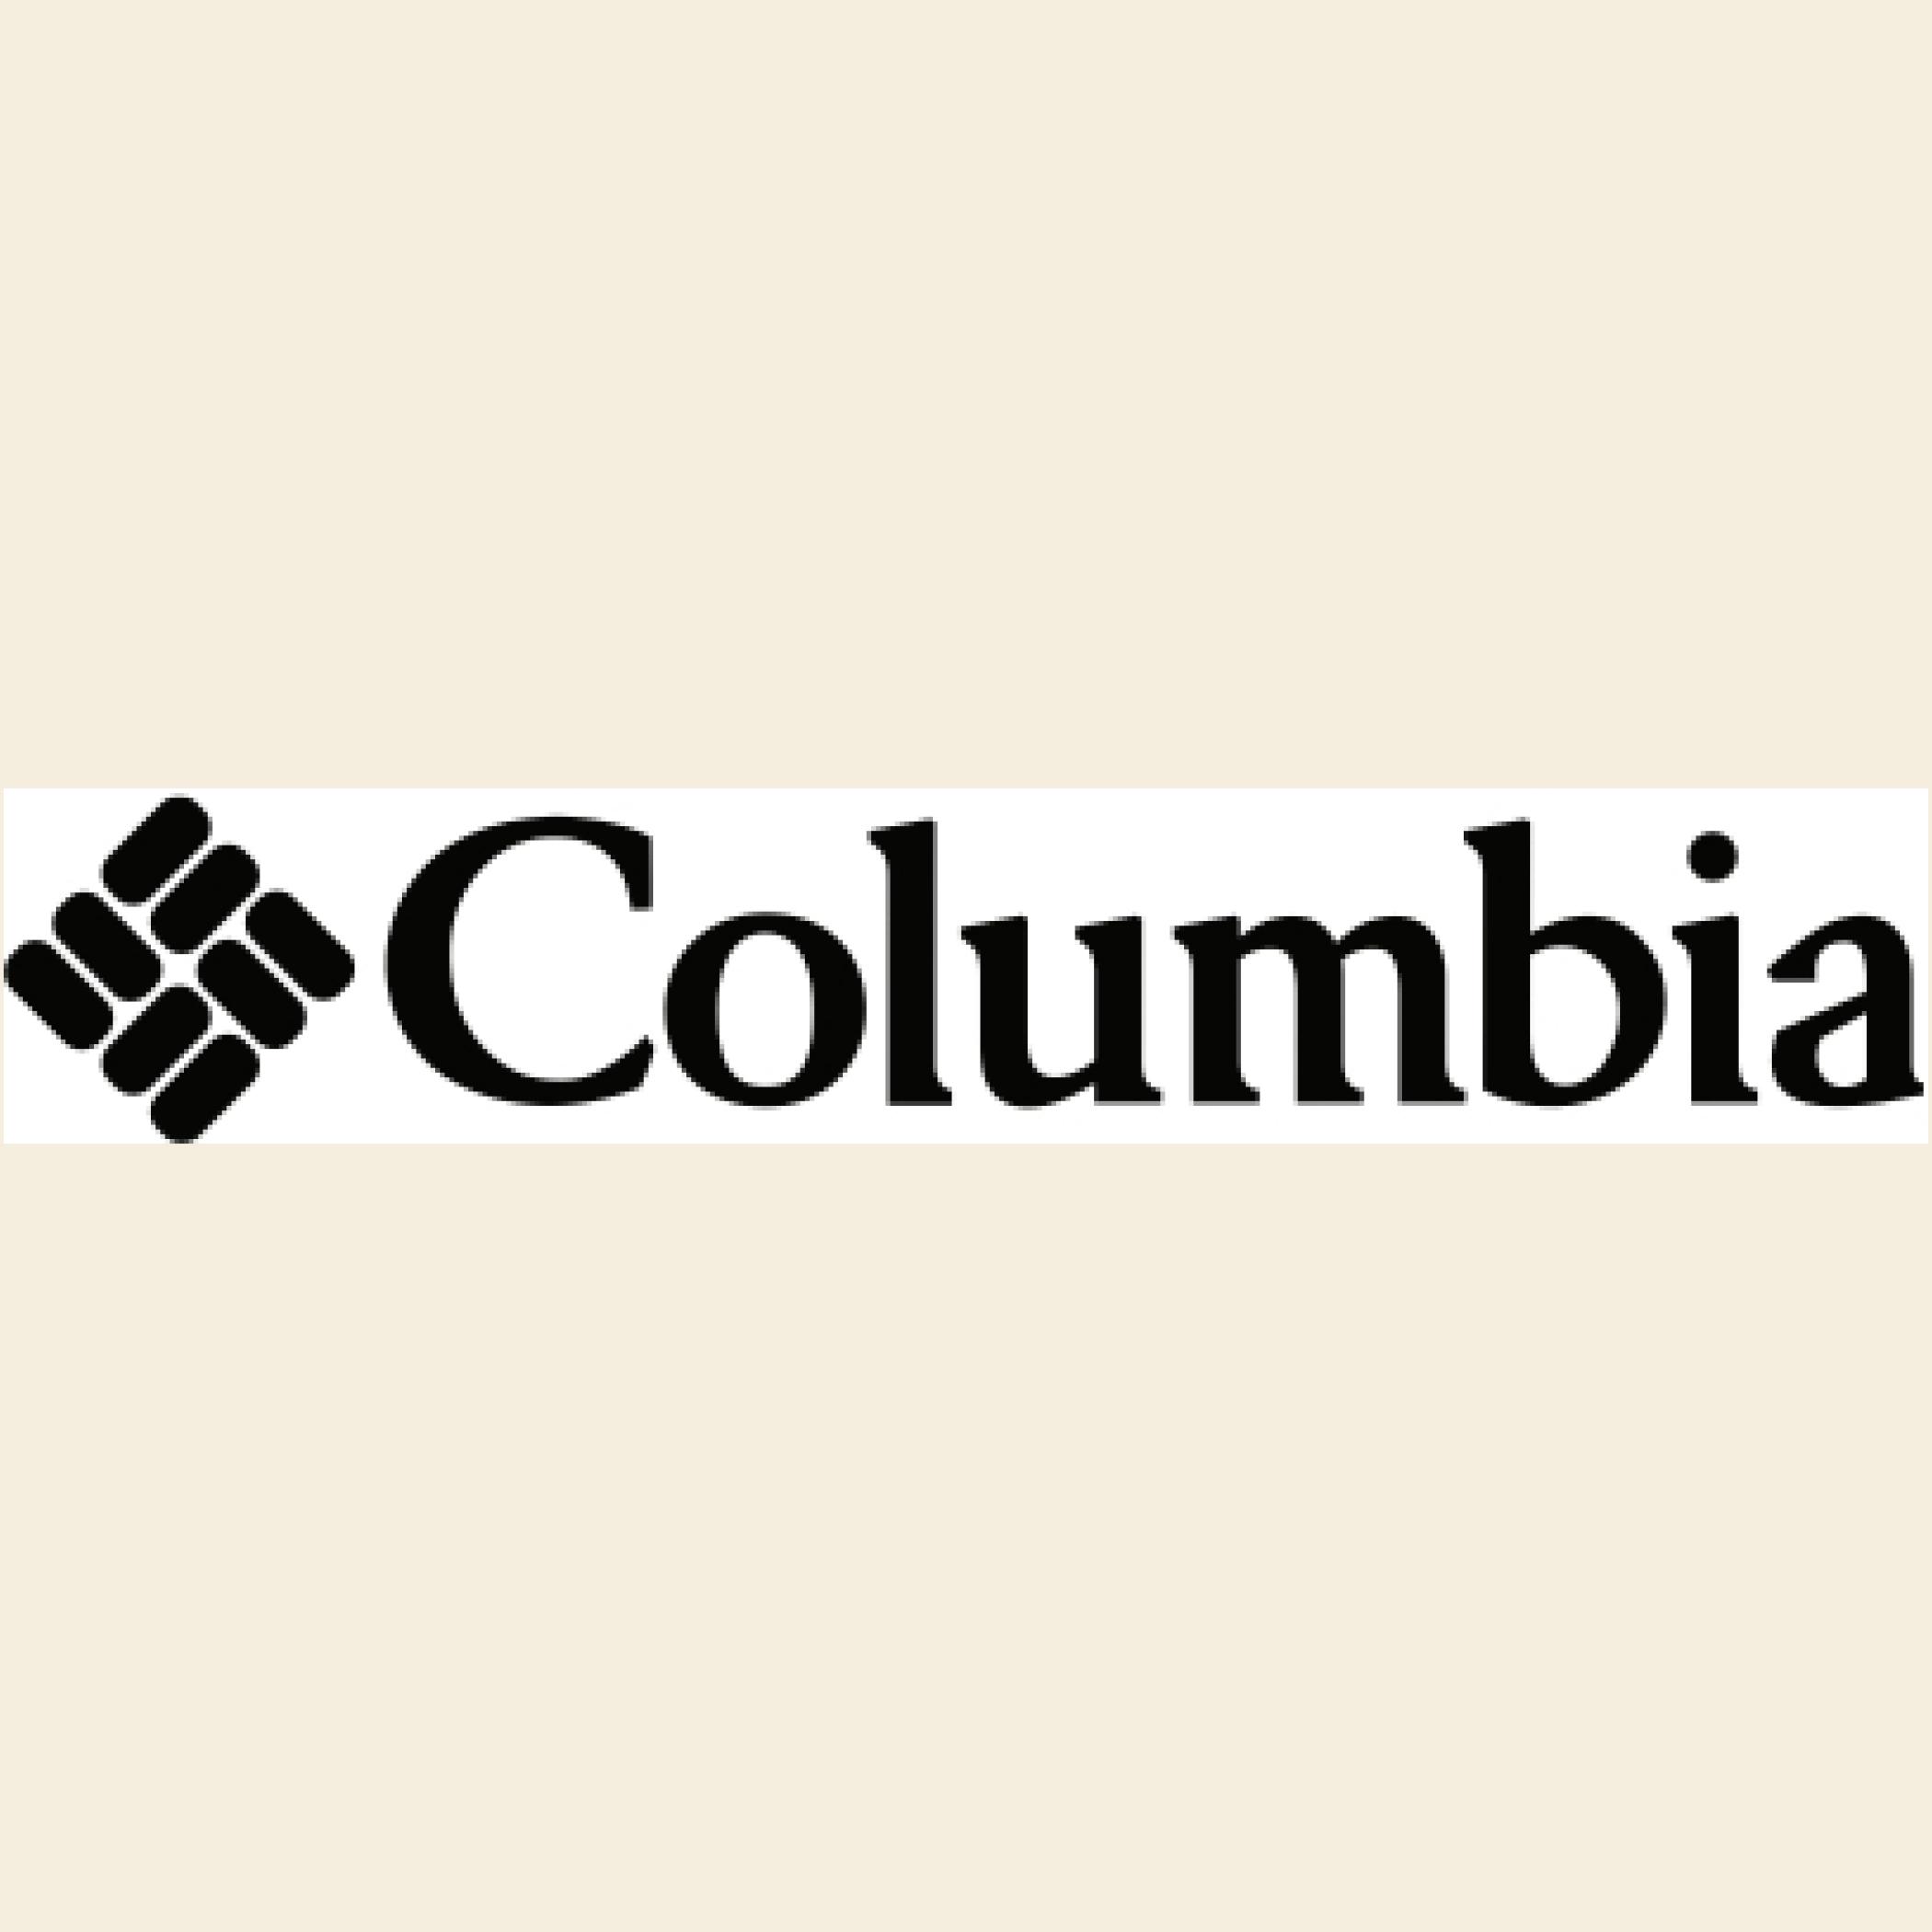 columbia sq.png